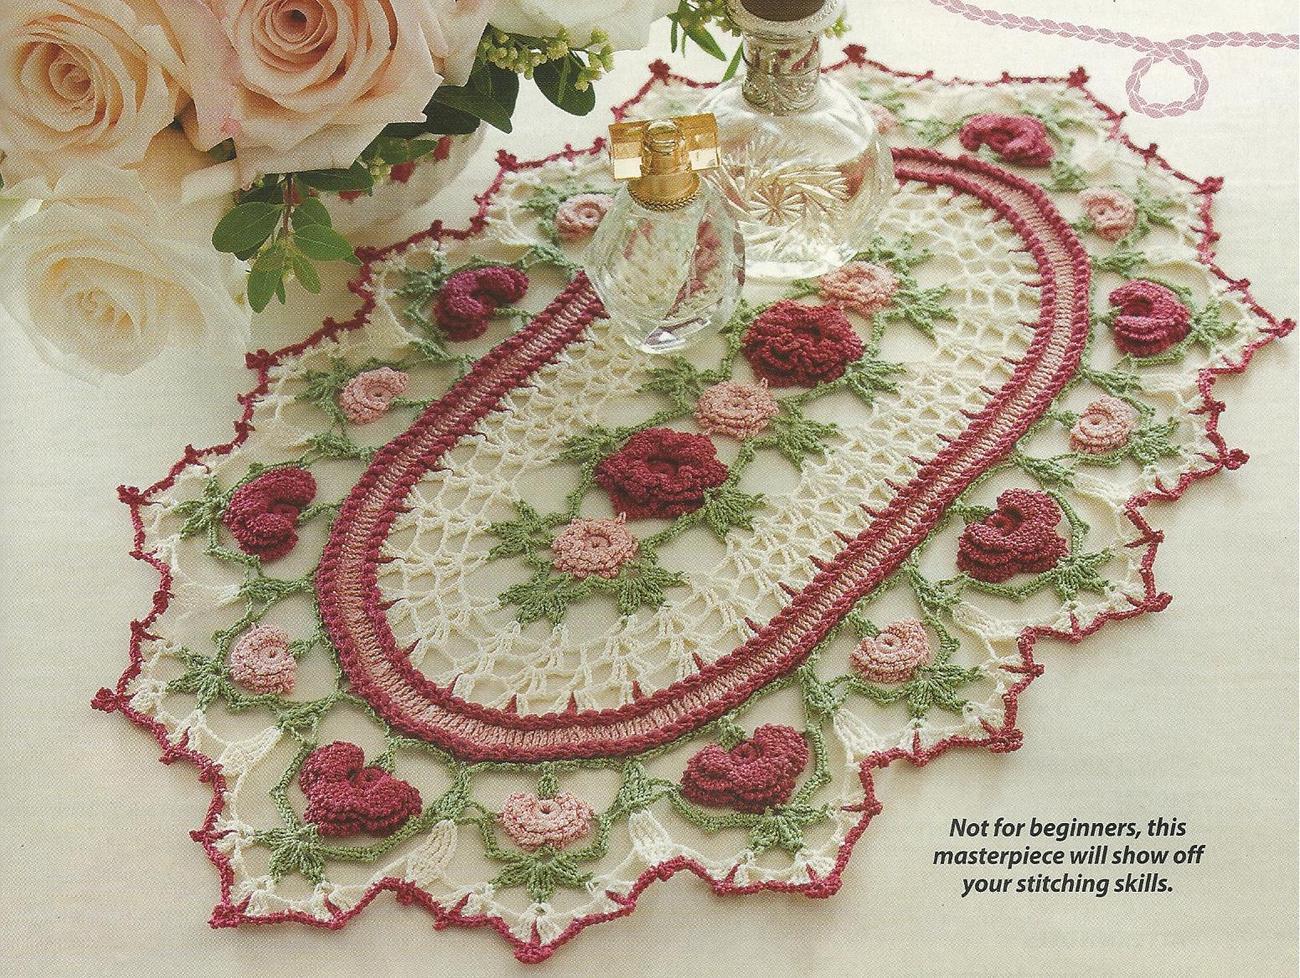 Rose parade doily thread crochet and 50 similar items crochet pattern 1115 dt1010fo